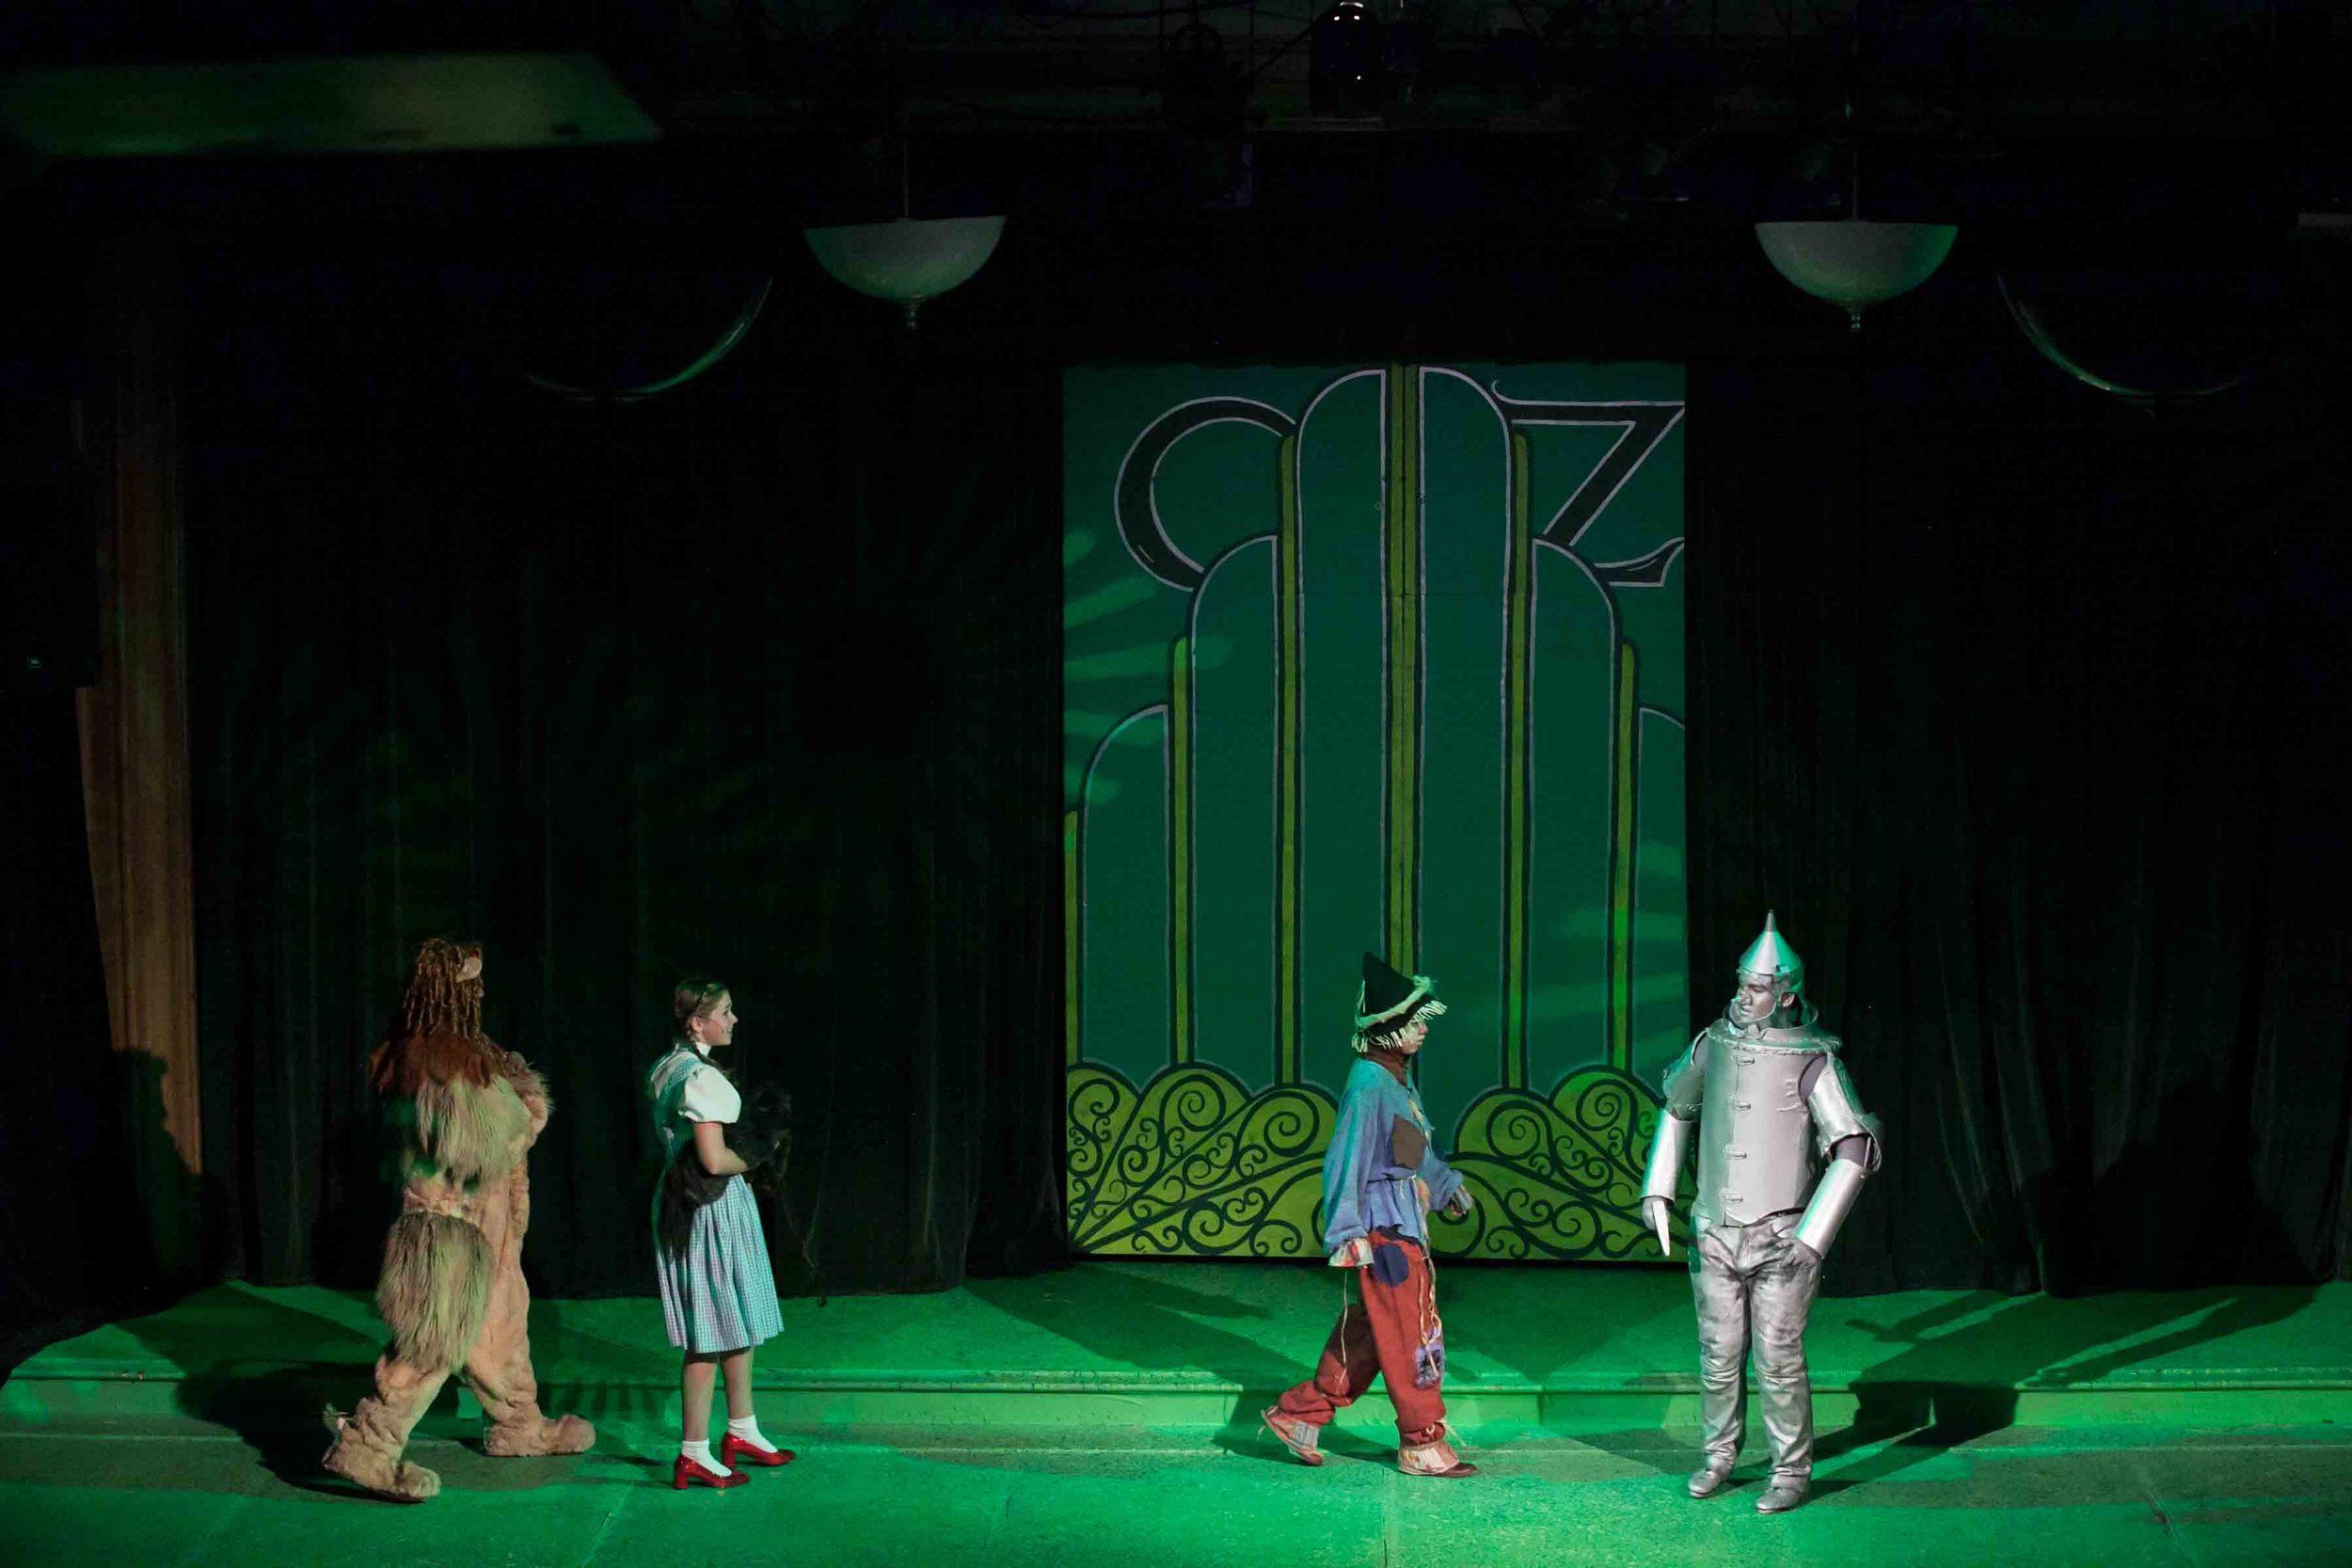 7-27-14 Oz-matinee 0179.jpg